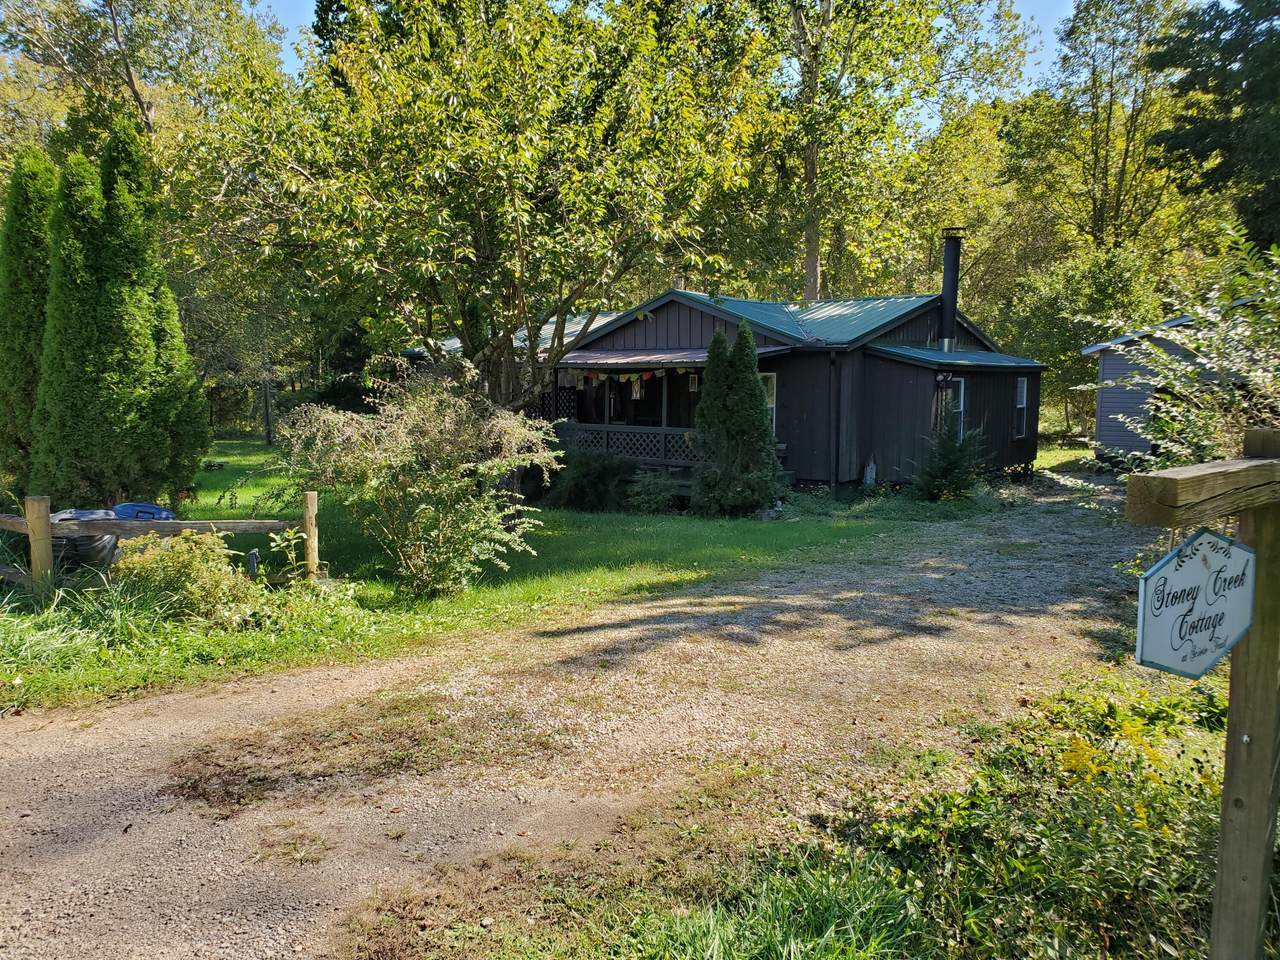 3174 Stoney Creek Road - Photo 1